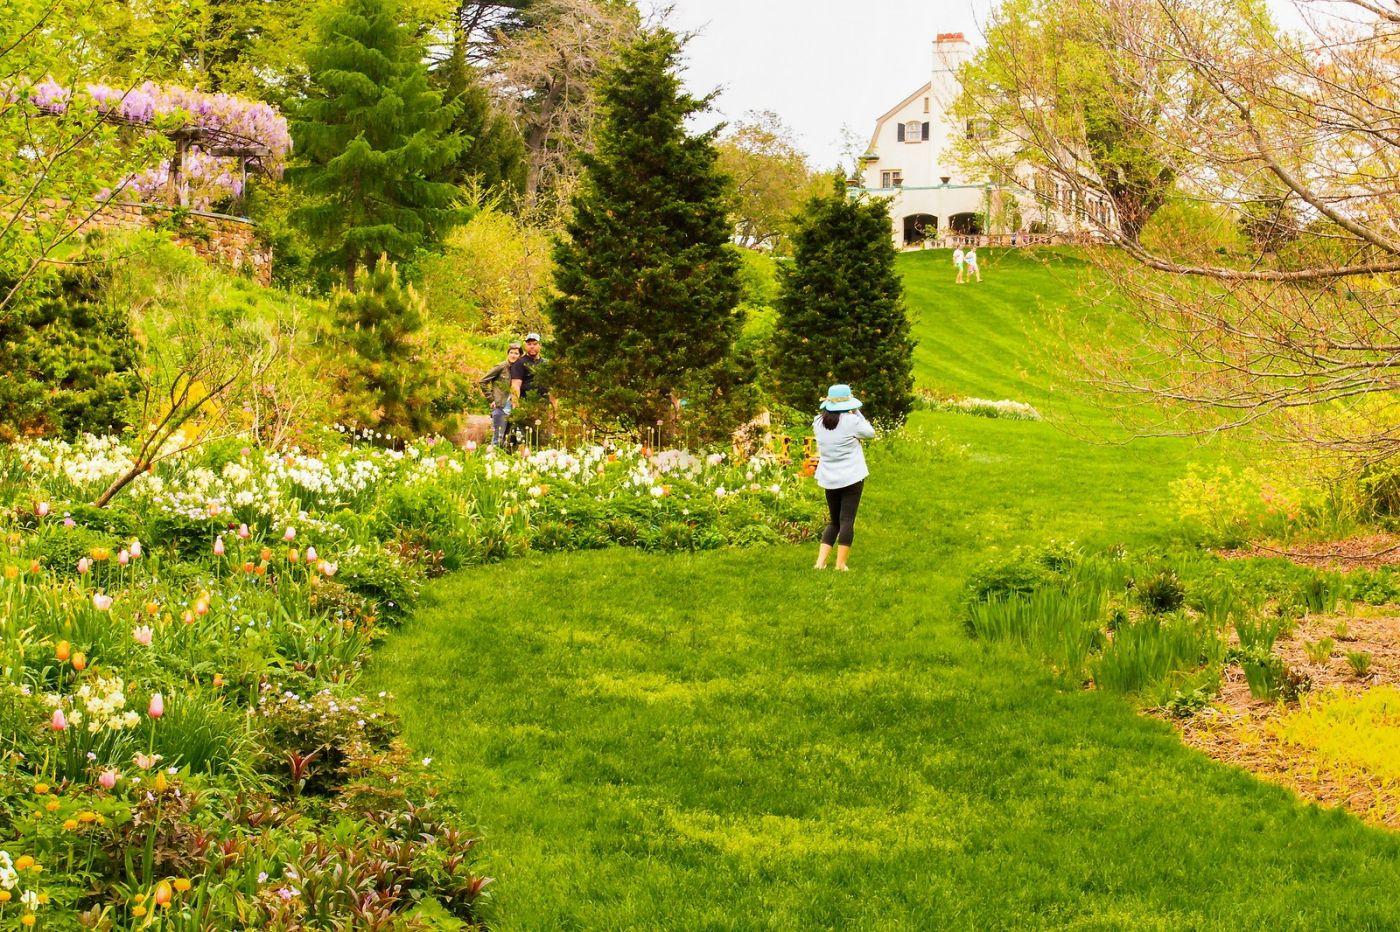 Chanticleer花园,享受大自然_图1-23